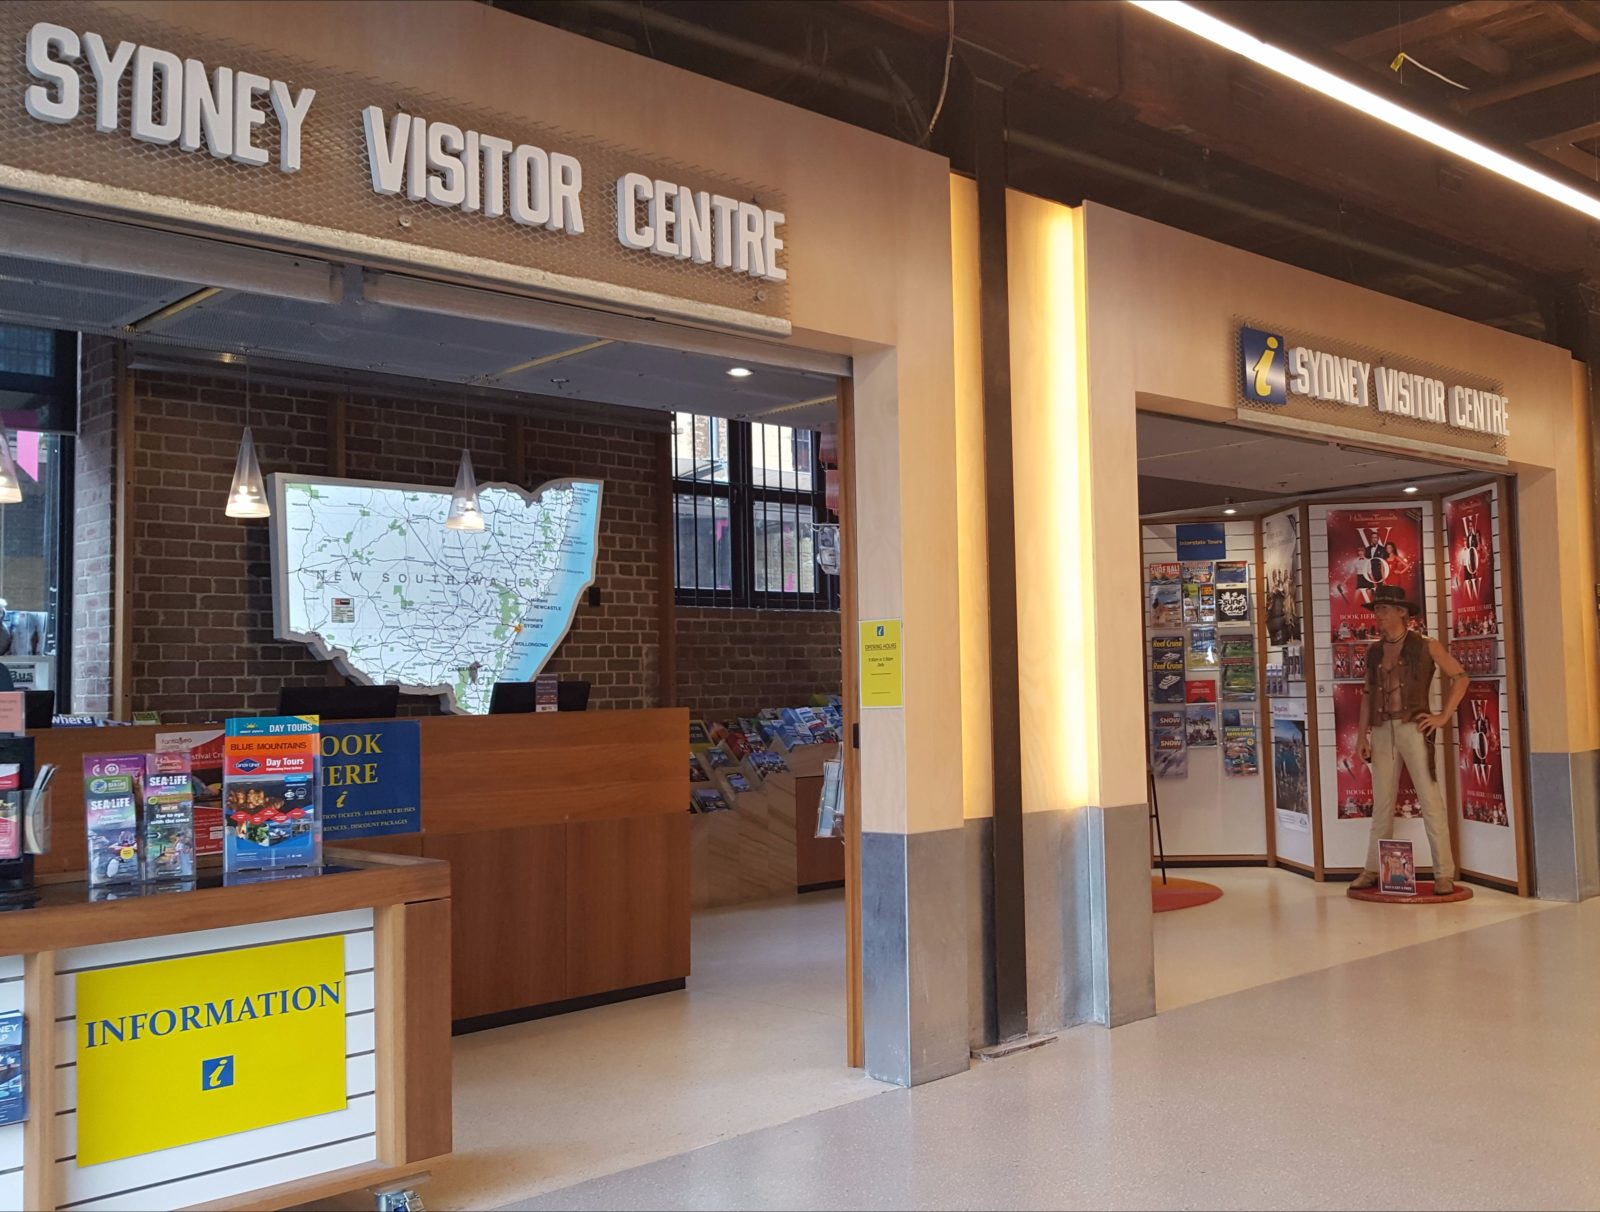 Sydney Visitor Centre at The Rocks